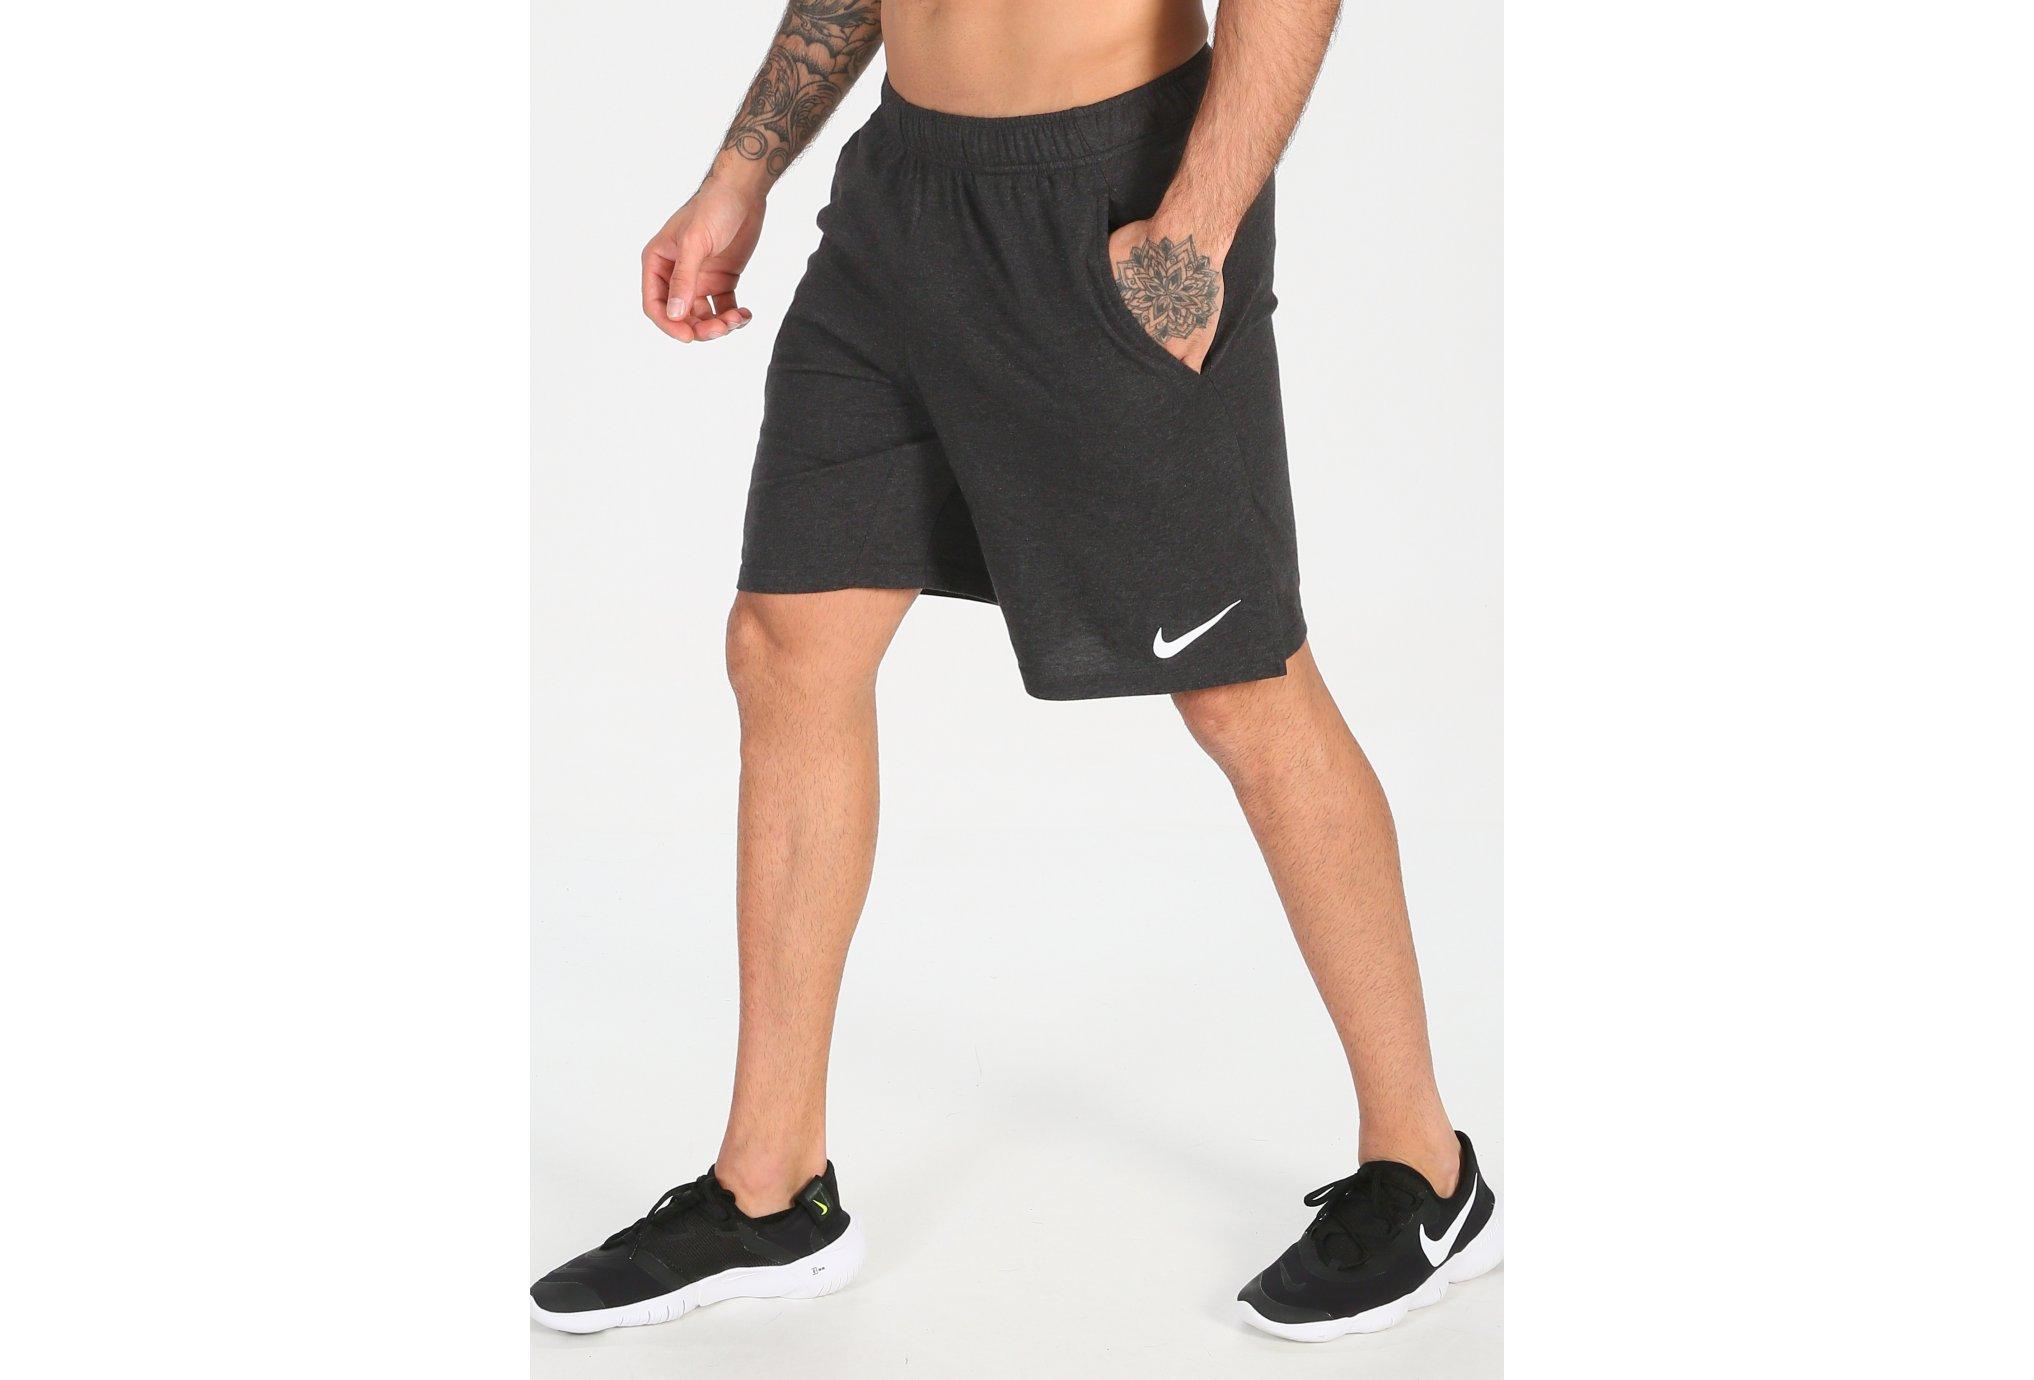 Nike Dri-Fit Cotton M vêtement running homme